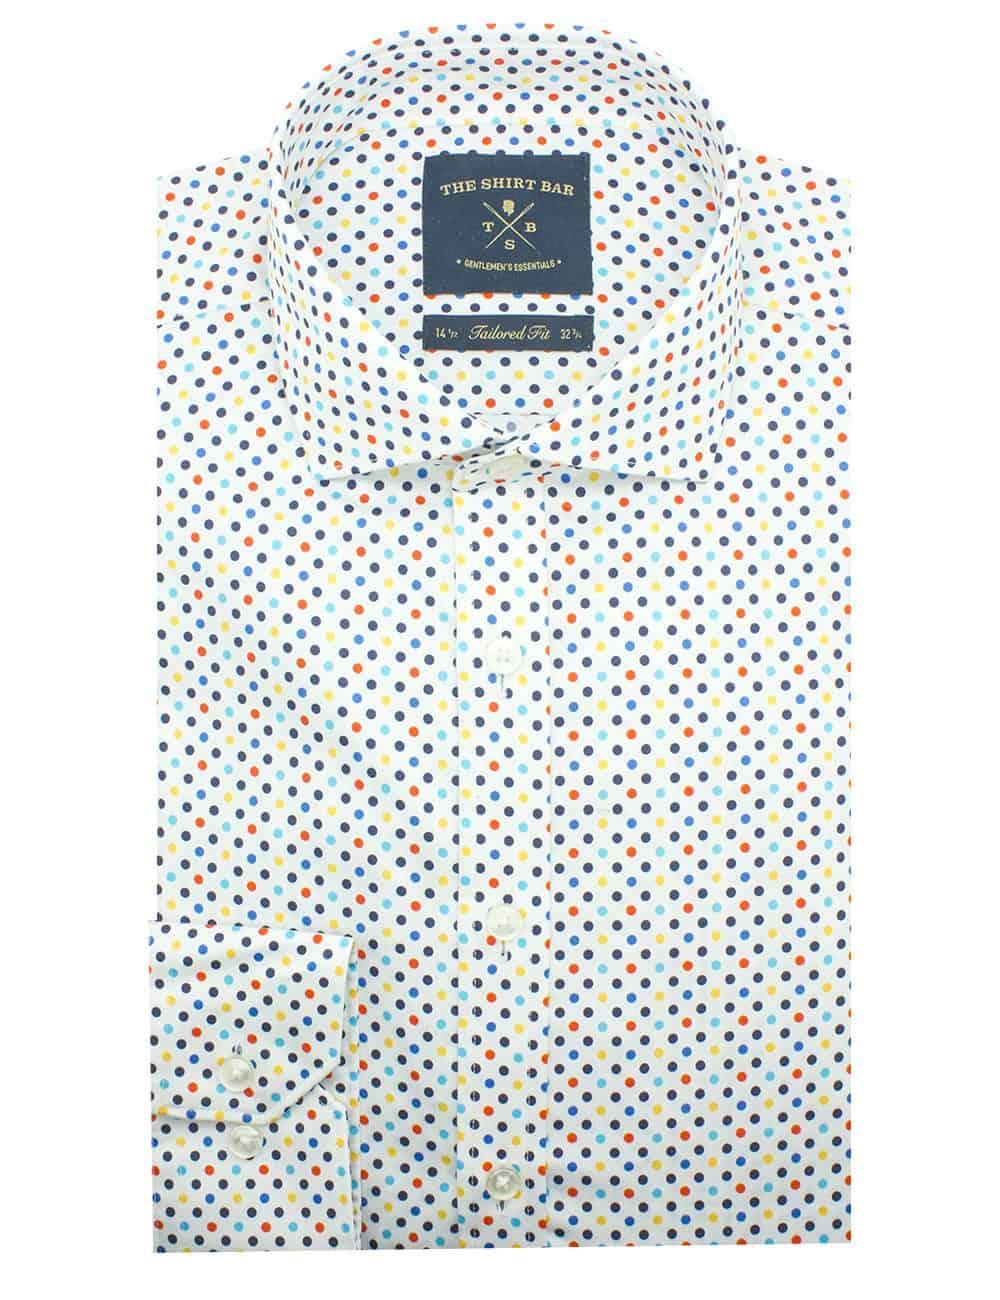 Tailored Fit 100% Premium Cotton Sateen Long Sleeve Single Cuff Men's Shirt (Digitally Printed)